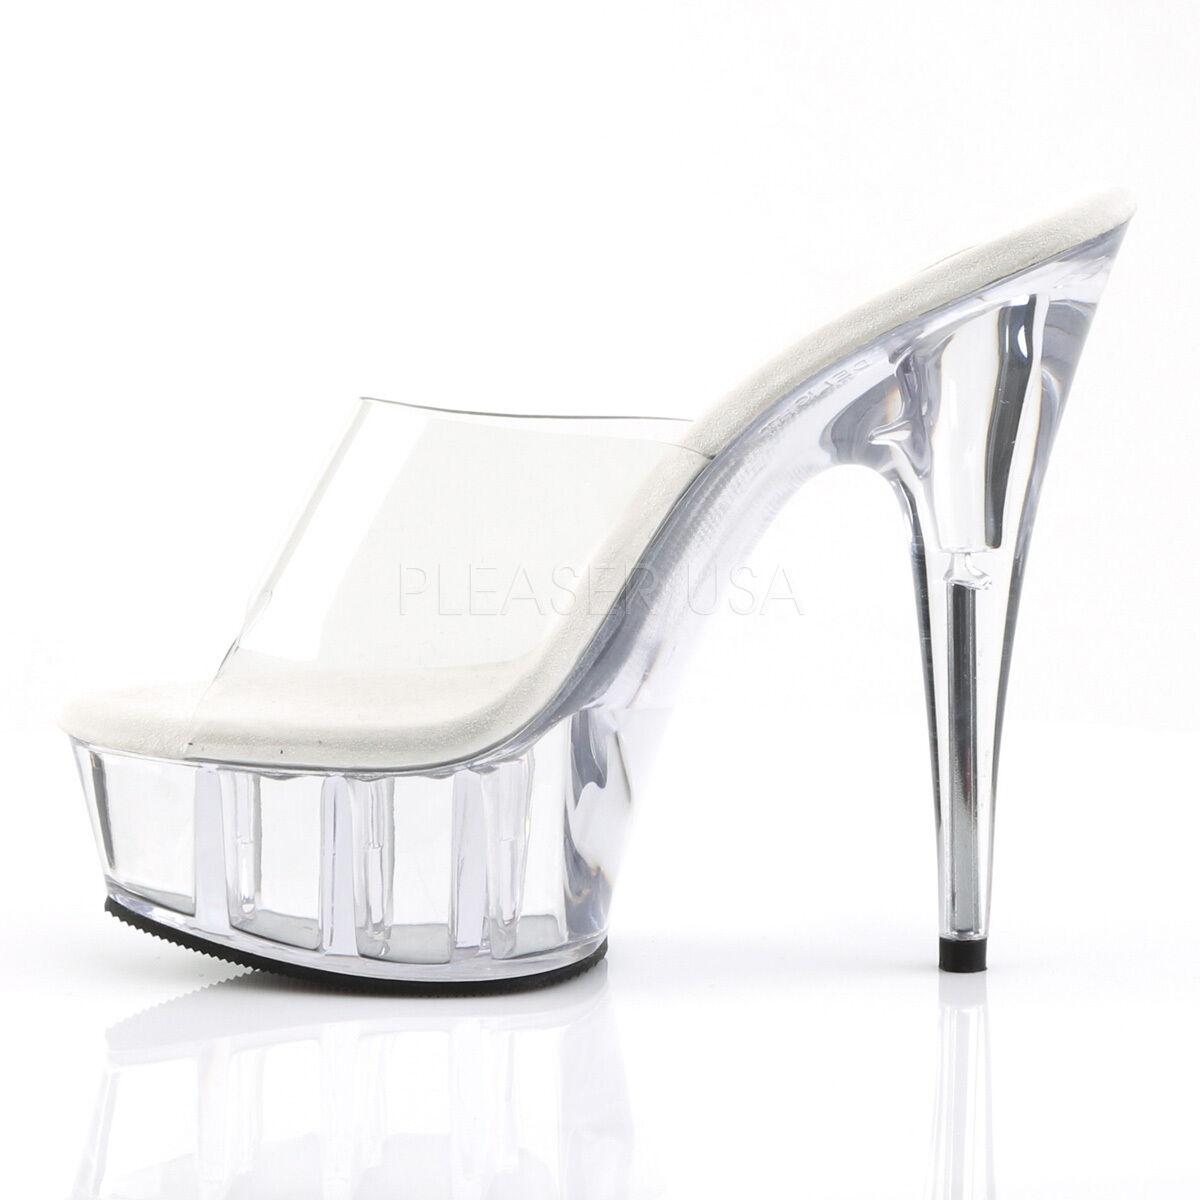 Descuento barato Pleaser Delight-601 Ladies Clear Stiletto Heel Platform Slide Pole Dance Shoes